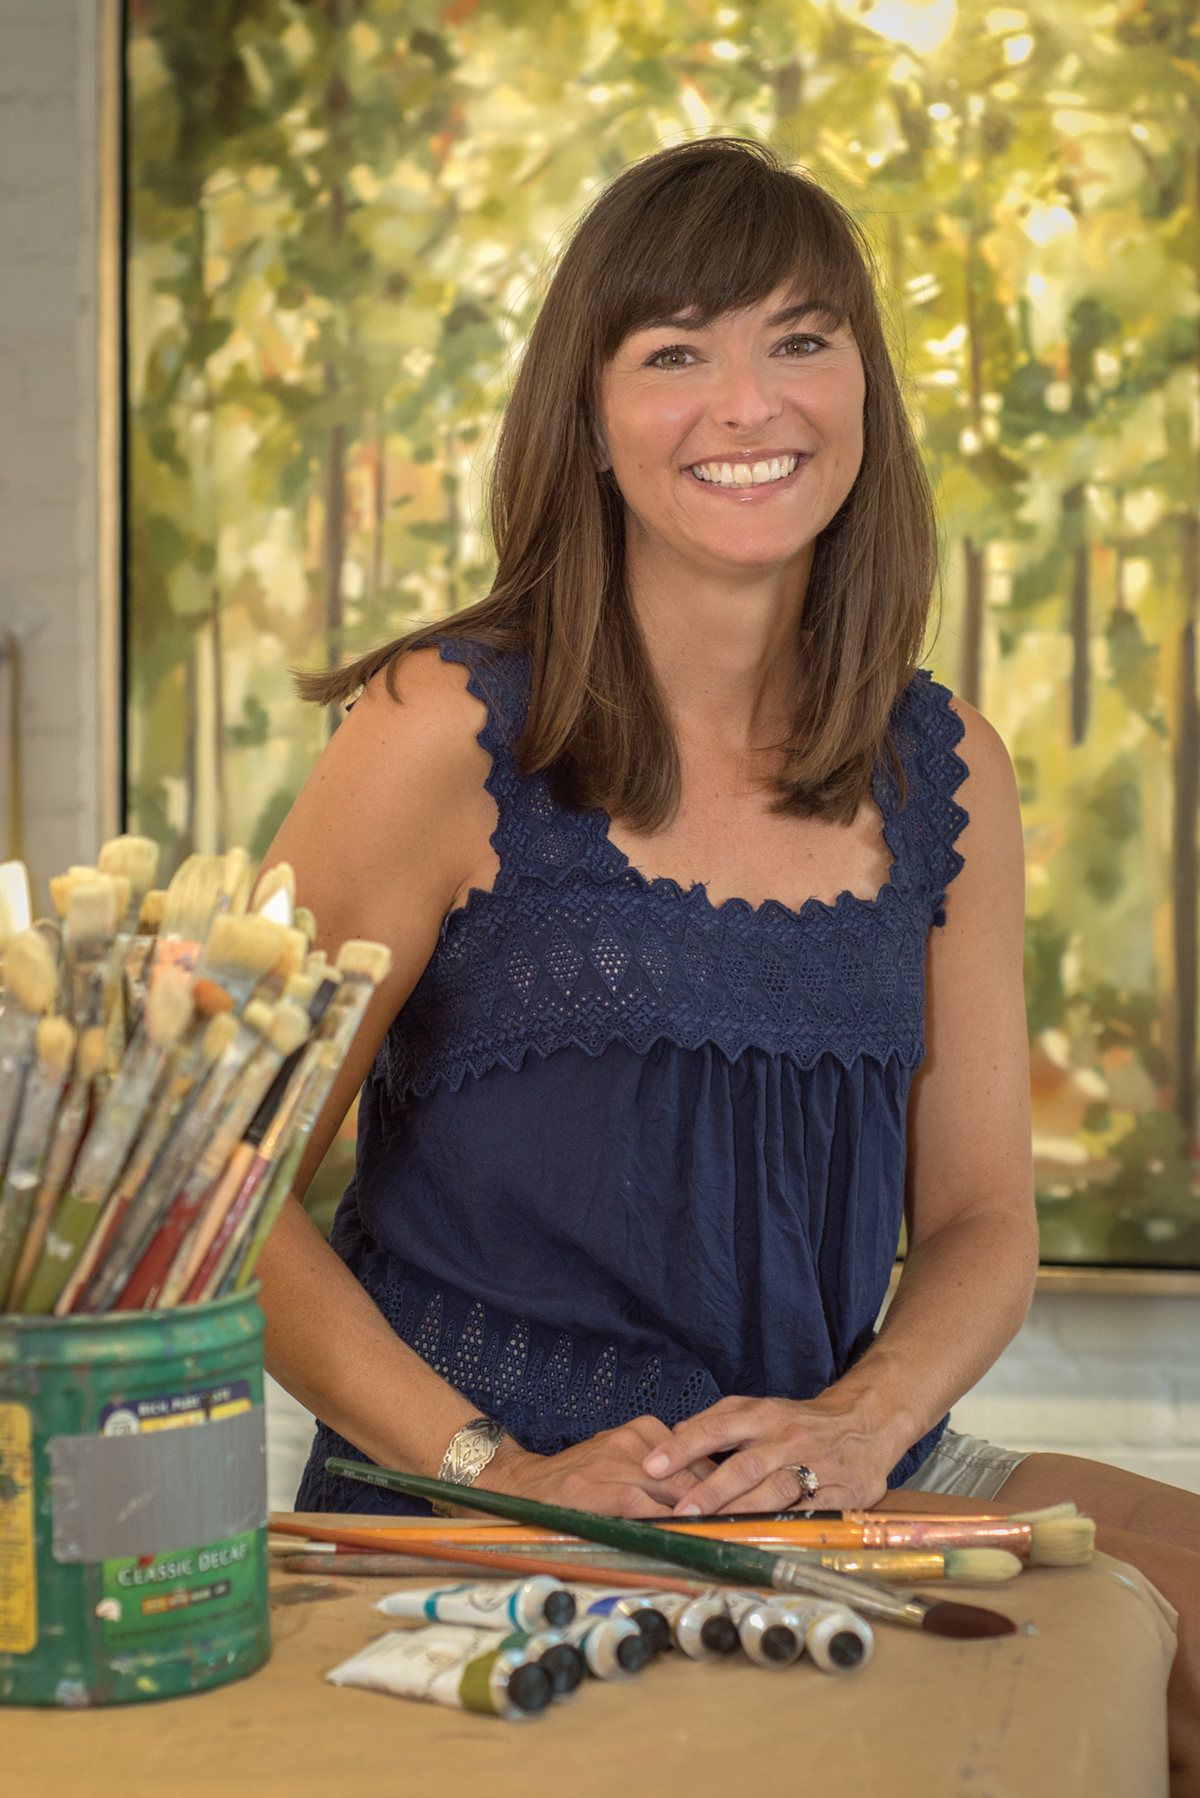 Cover Artist Cheyenne Trunnell